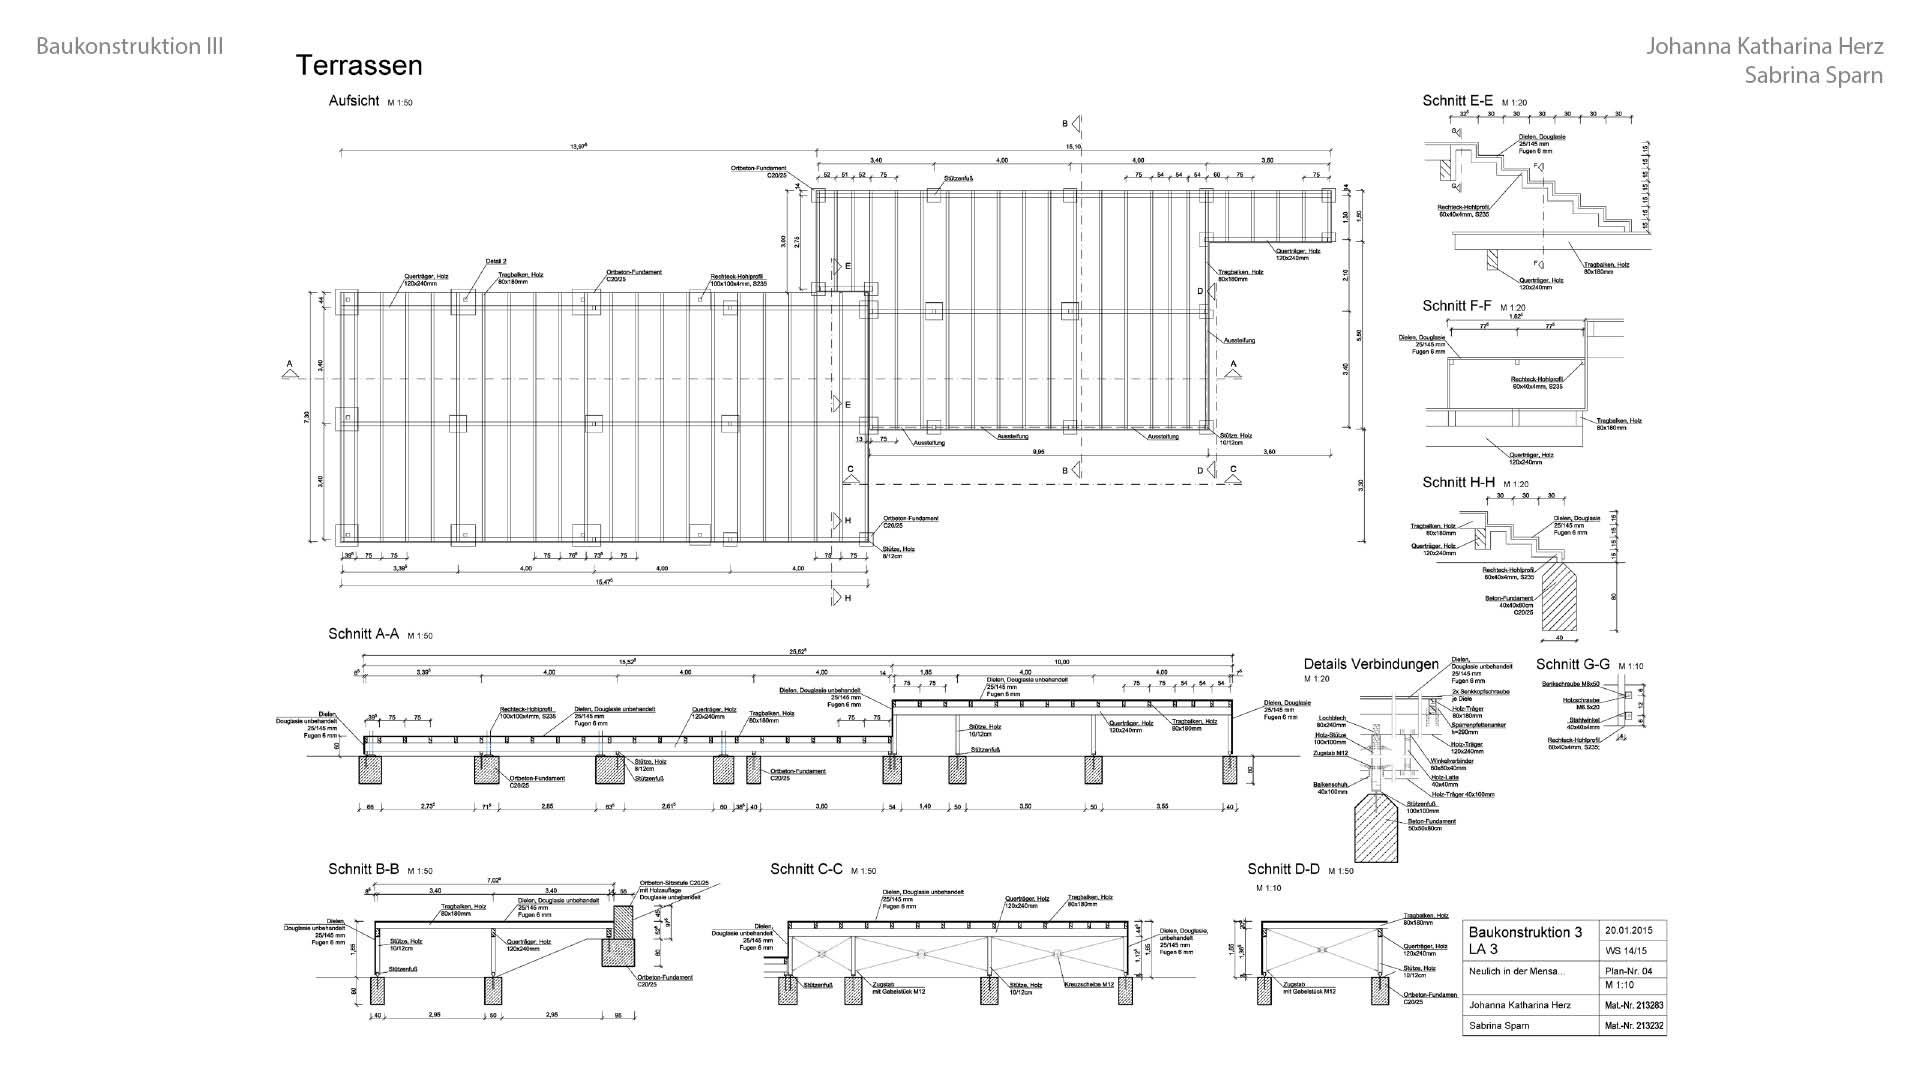 09 14 03 Baukonstruktion III